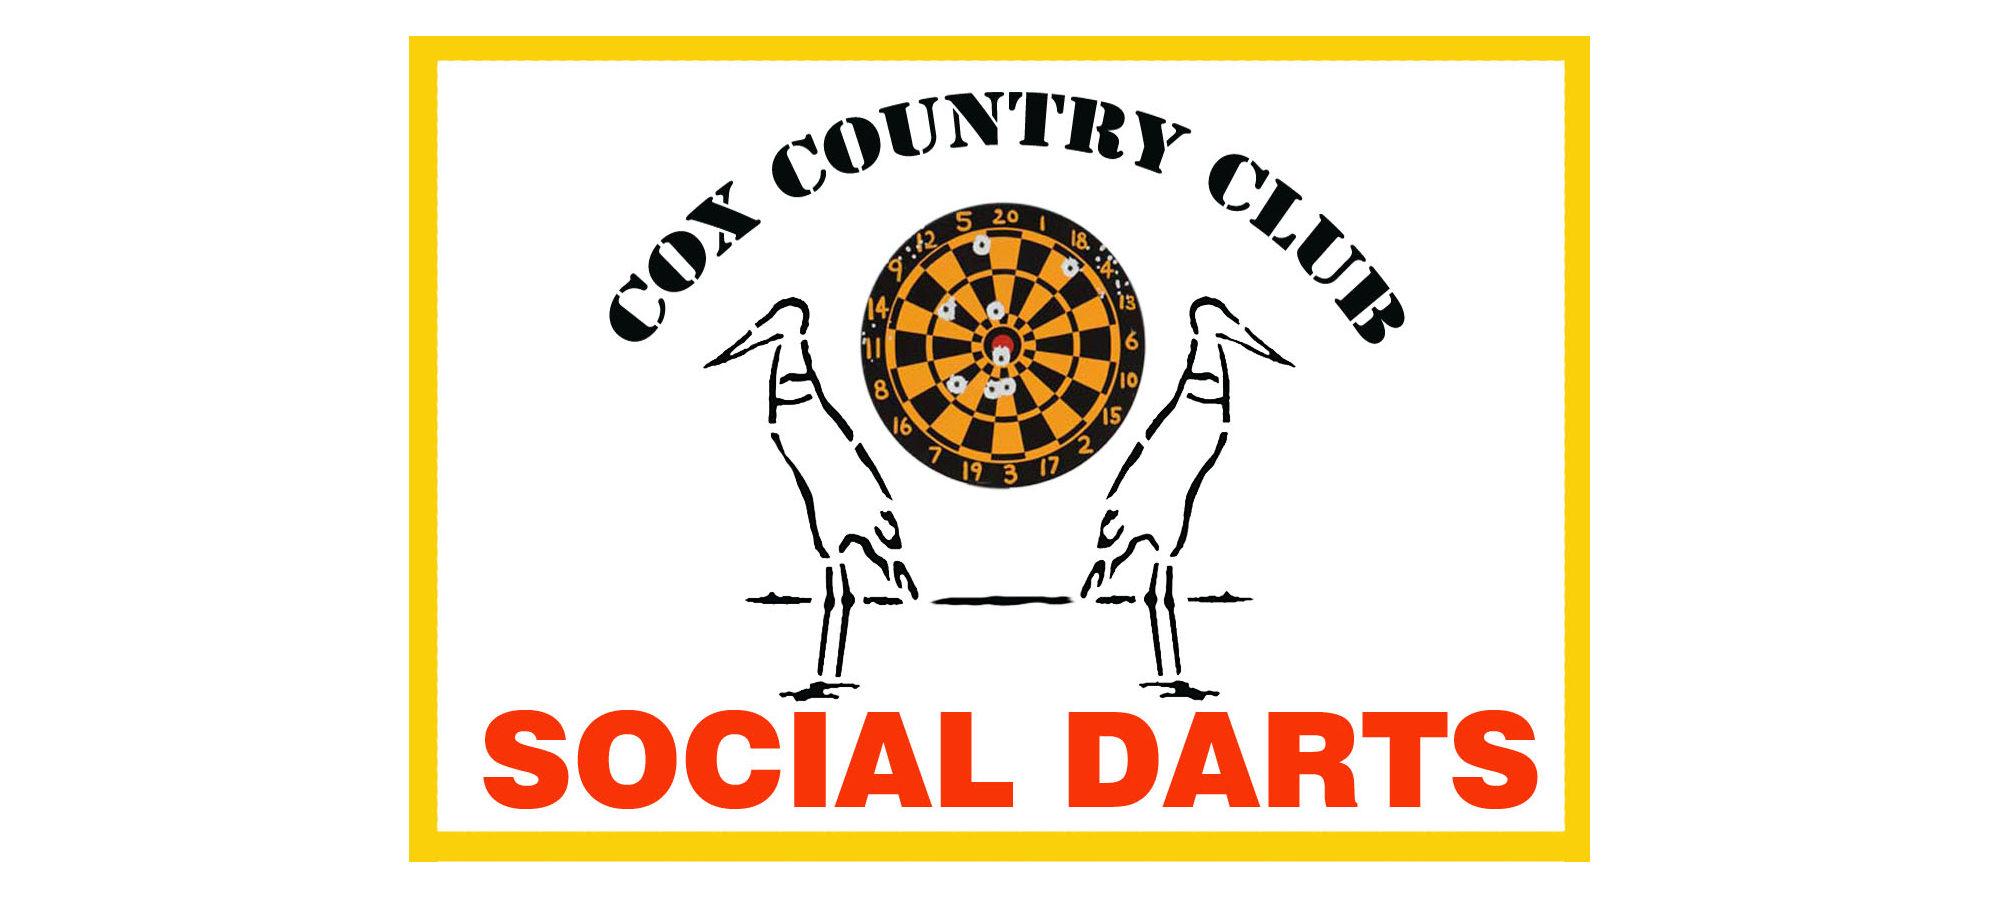 Download Social Darts image